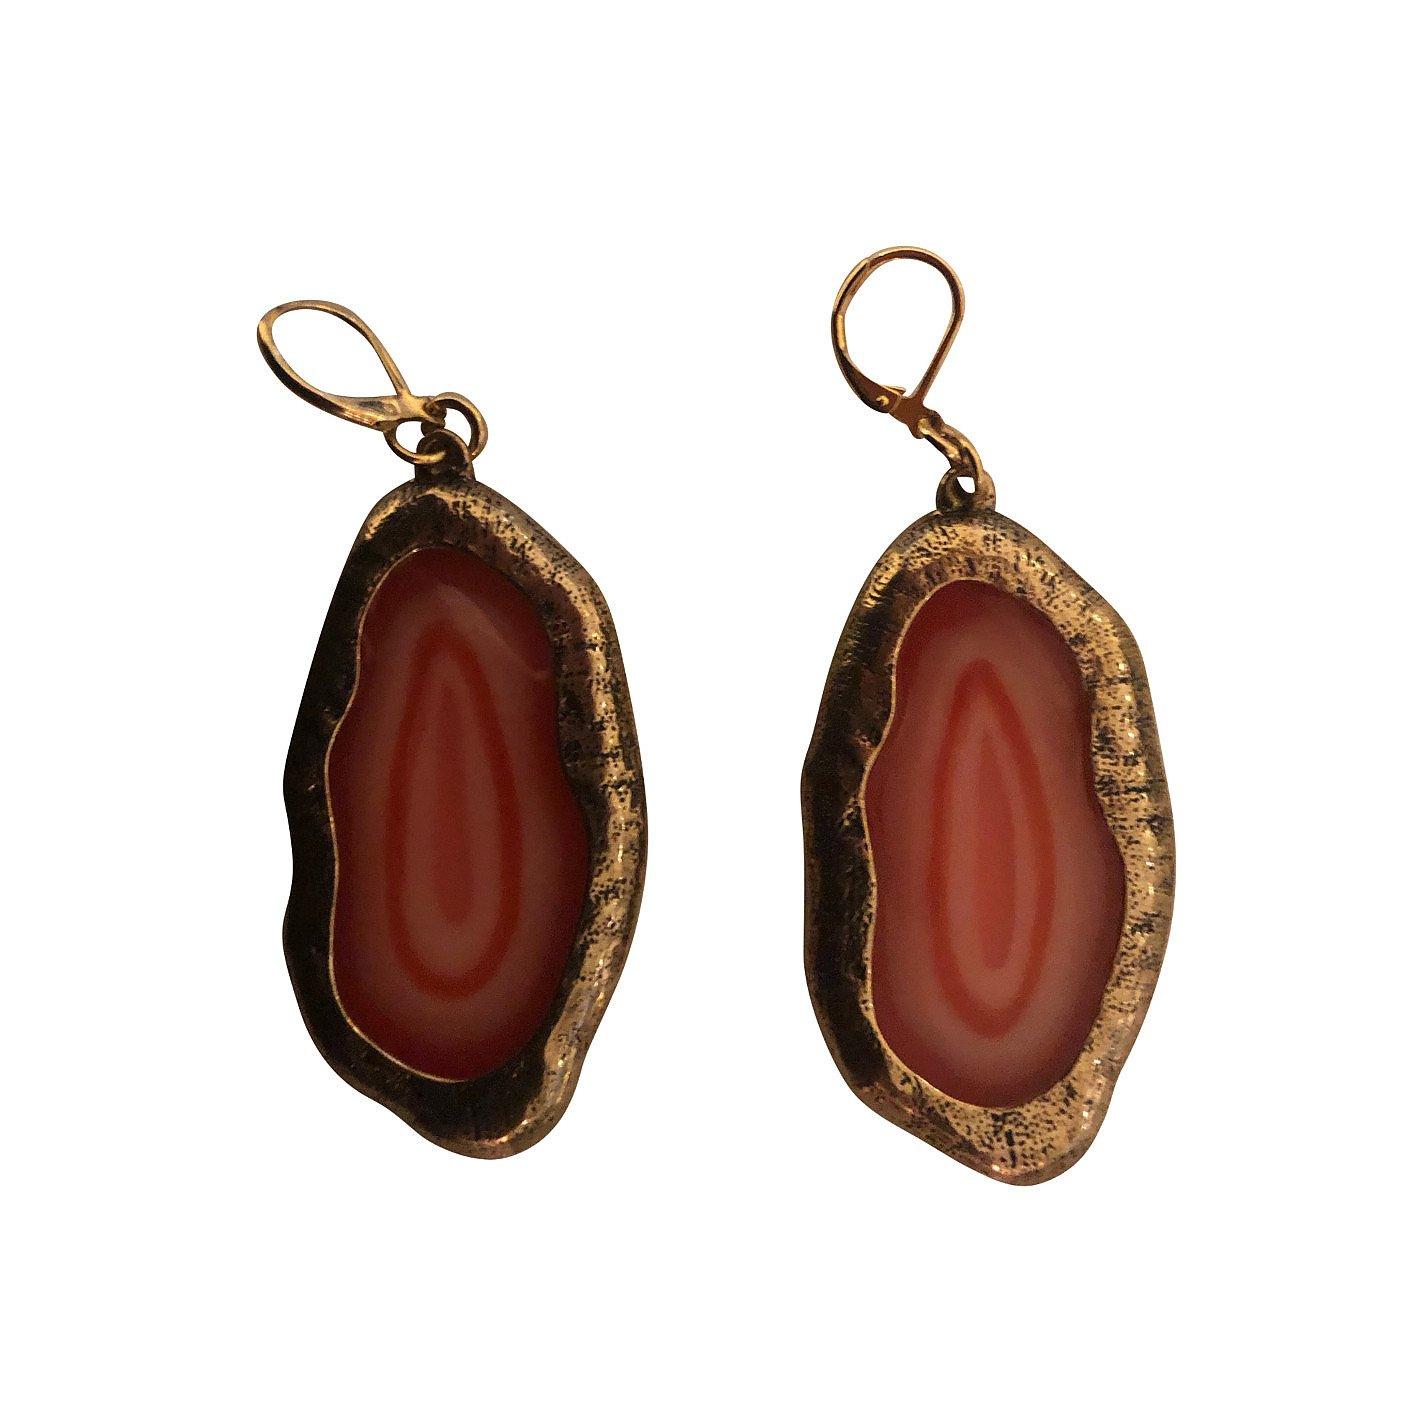 Kenneth Lane Marbled Stone Earrings